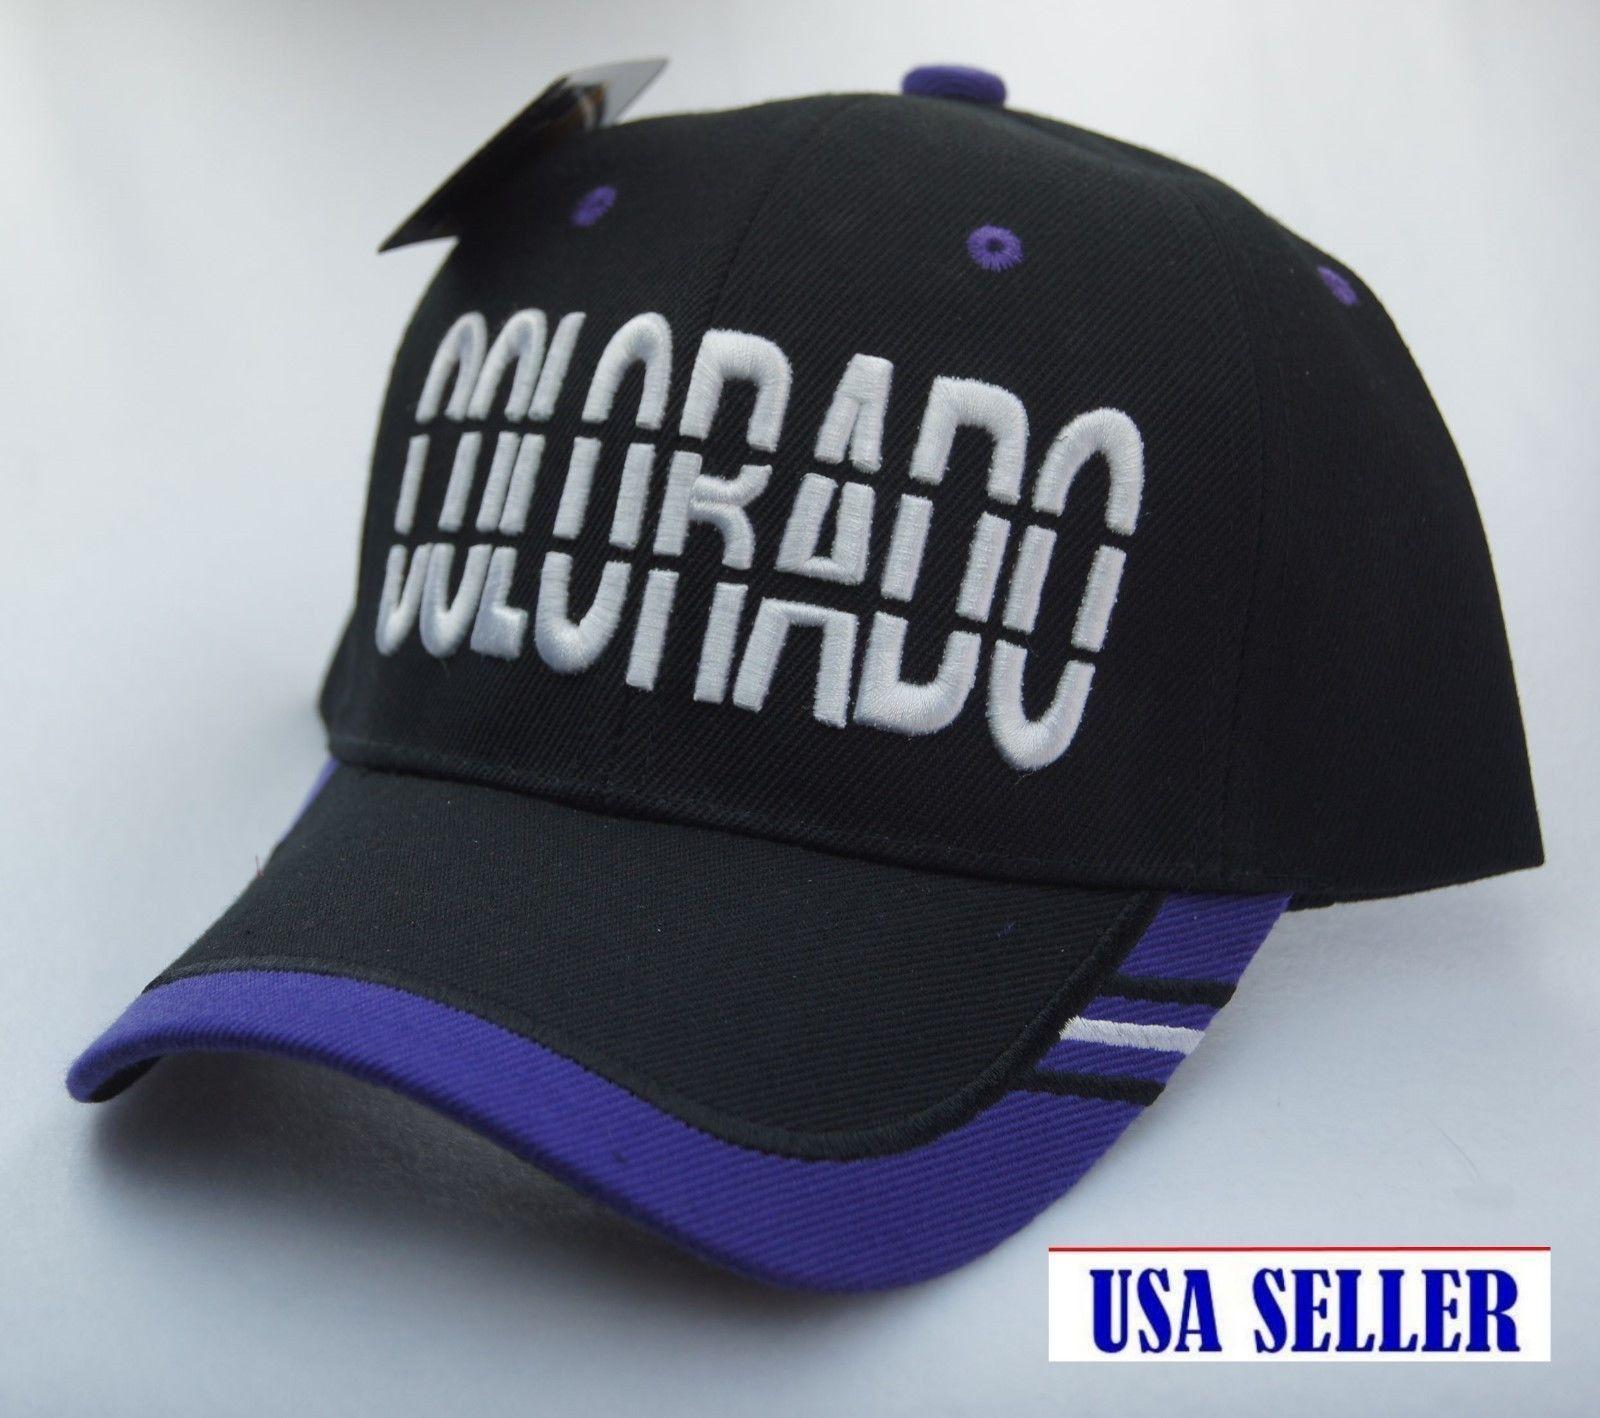 9207765c698 New COLORADO LOGO Baseball Caps Curved Bill Hat Adjustable Velcro ...